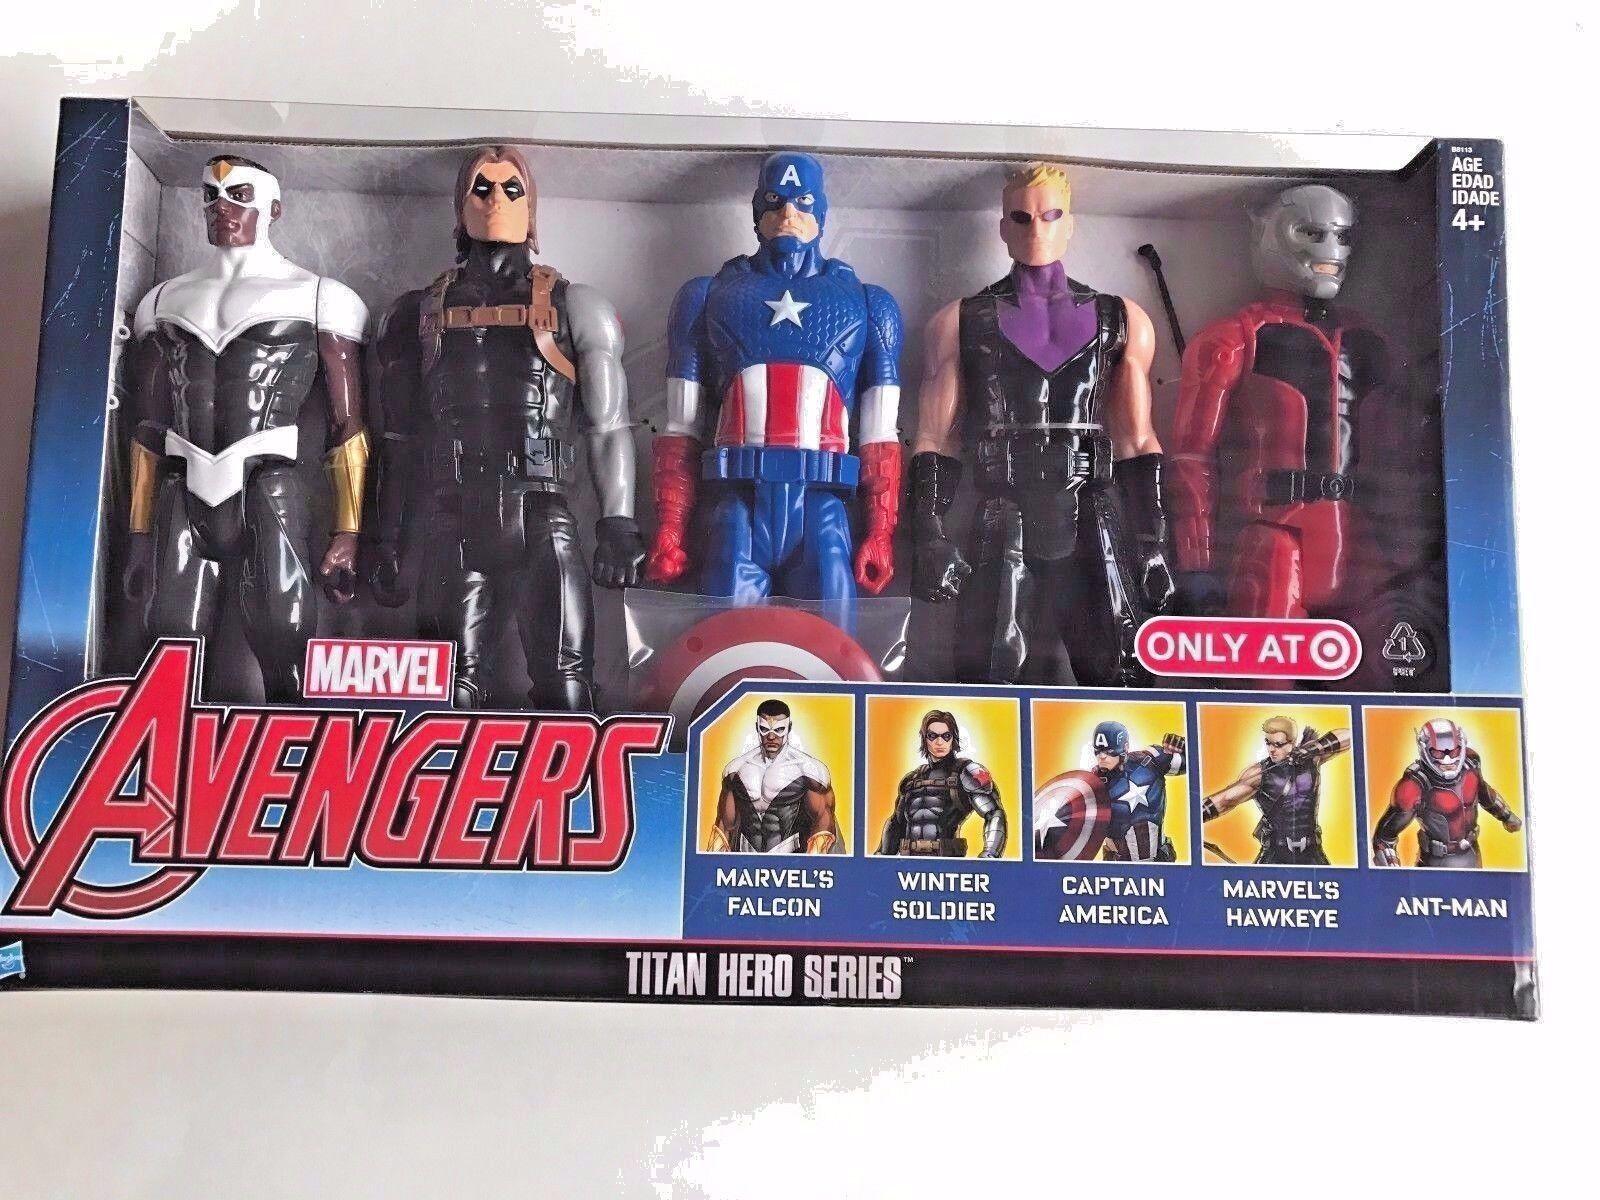 Marvel Avengers Titan Hero Series Captain America 5 Pack Action Figures Toy